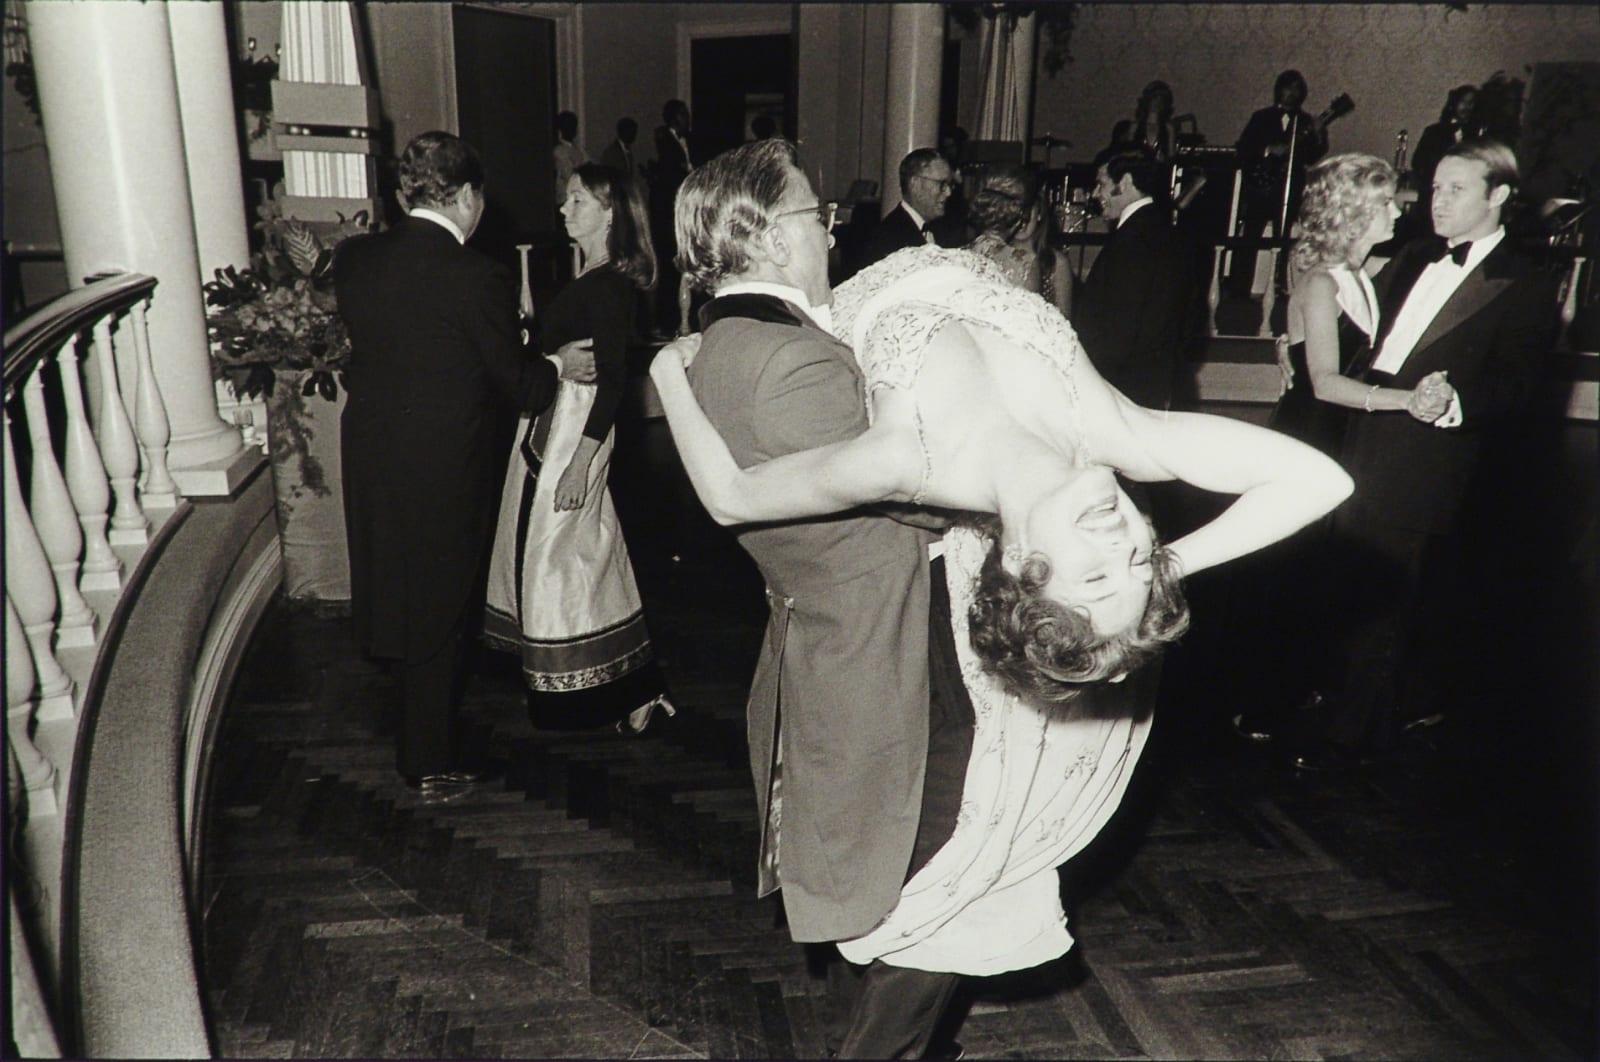 Geoff Winningham - Allegra Ball, Houston, 1972